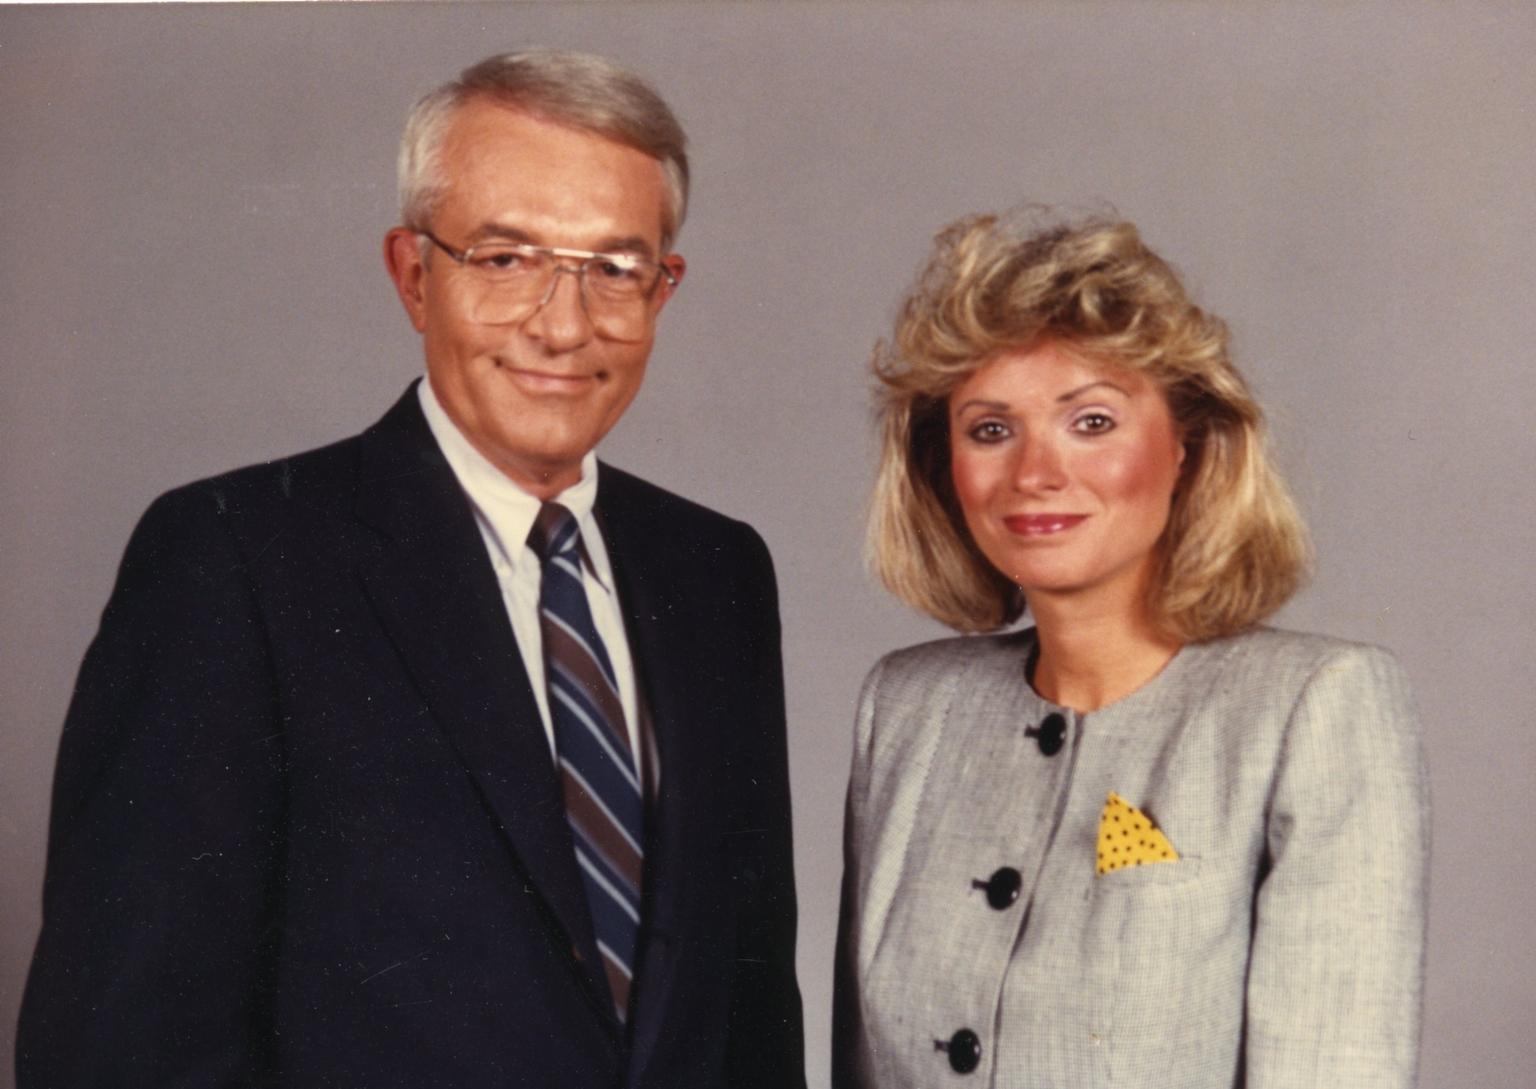 News director Tom Butler and news anchor Vicki Dortch